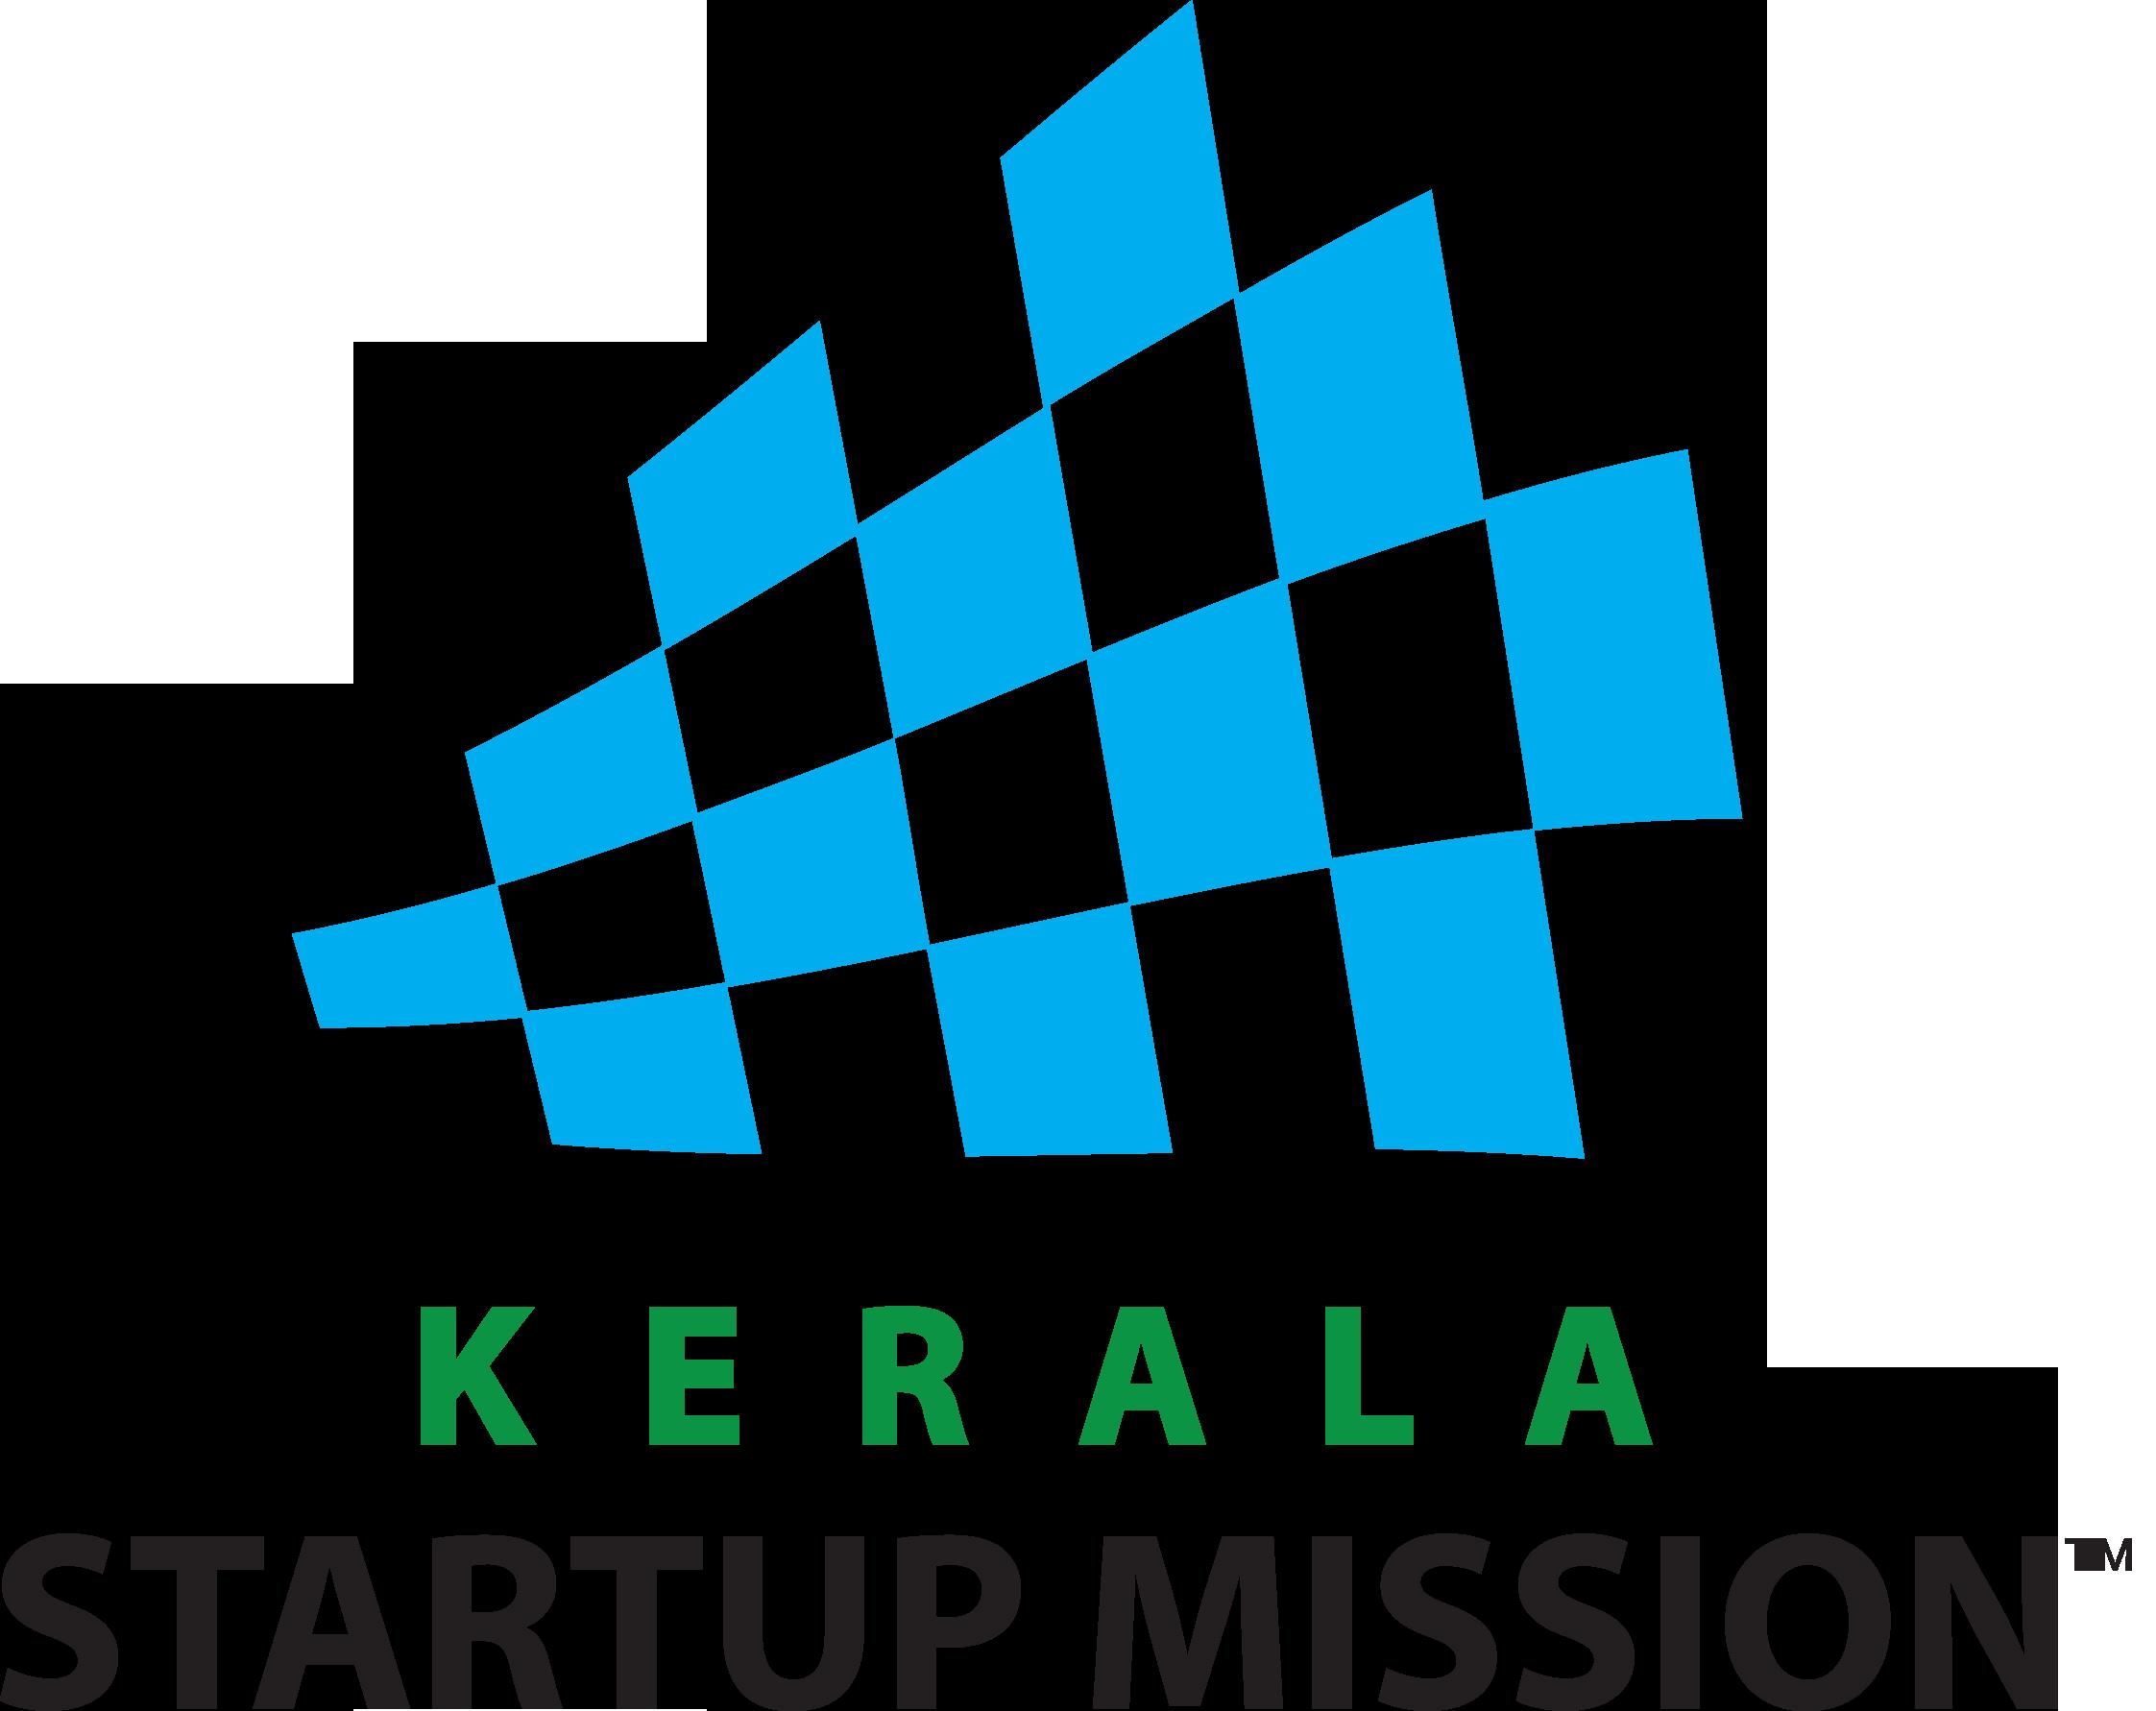 Kerala Startup Mission Logo.png